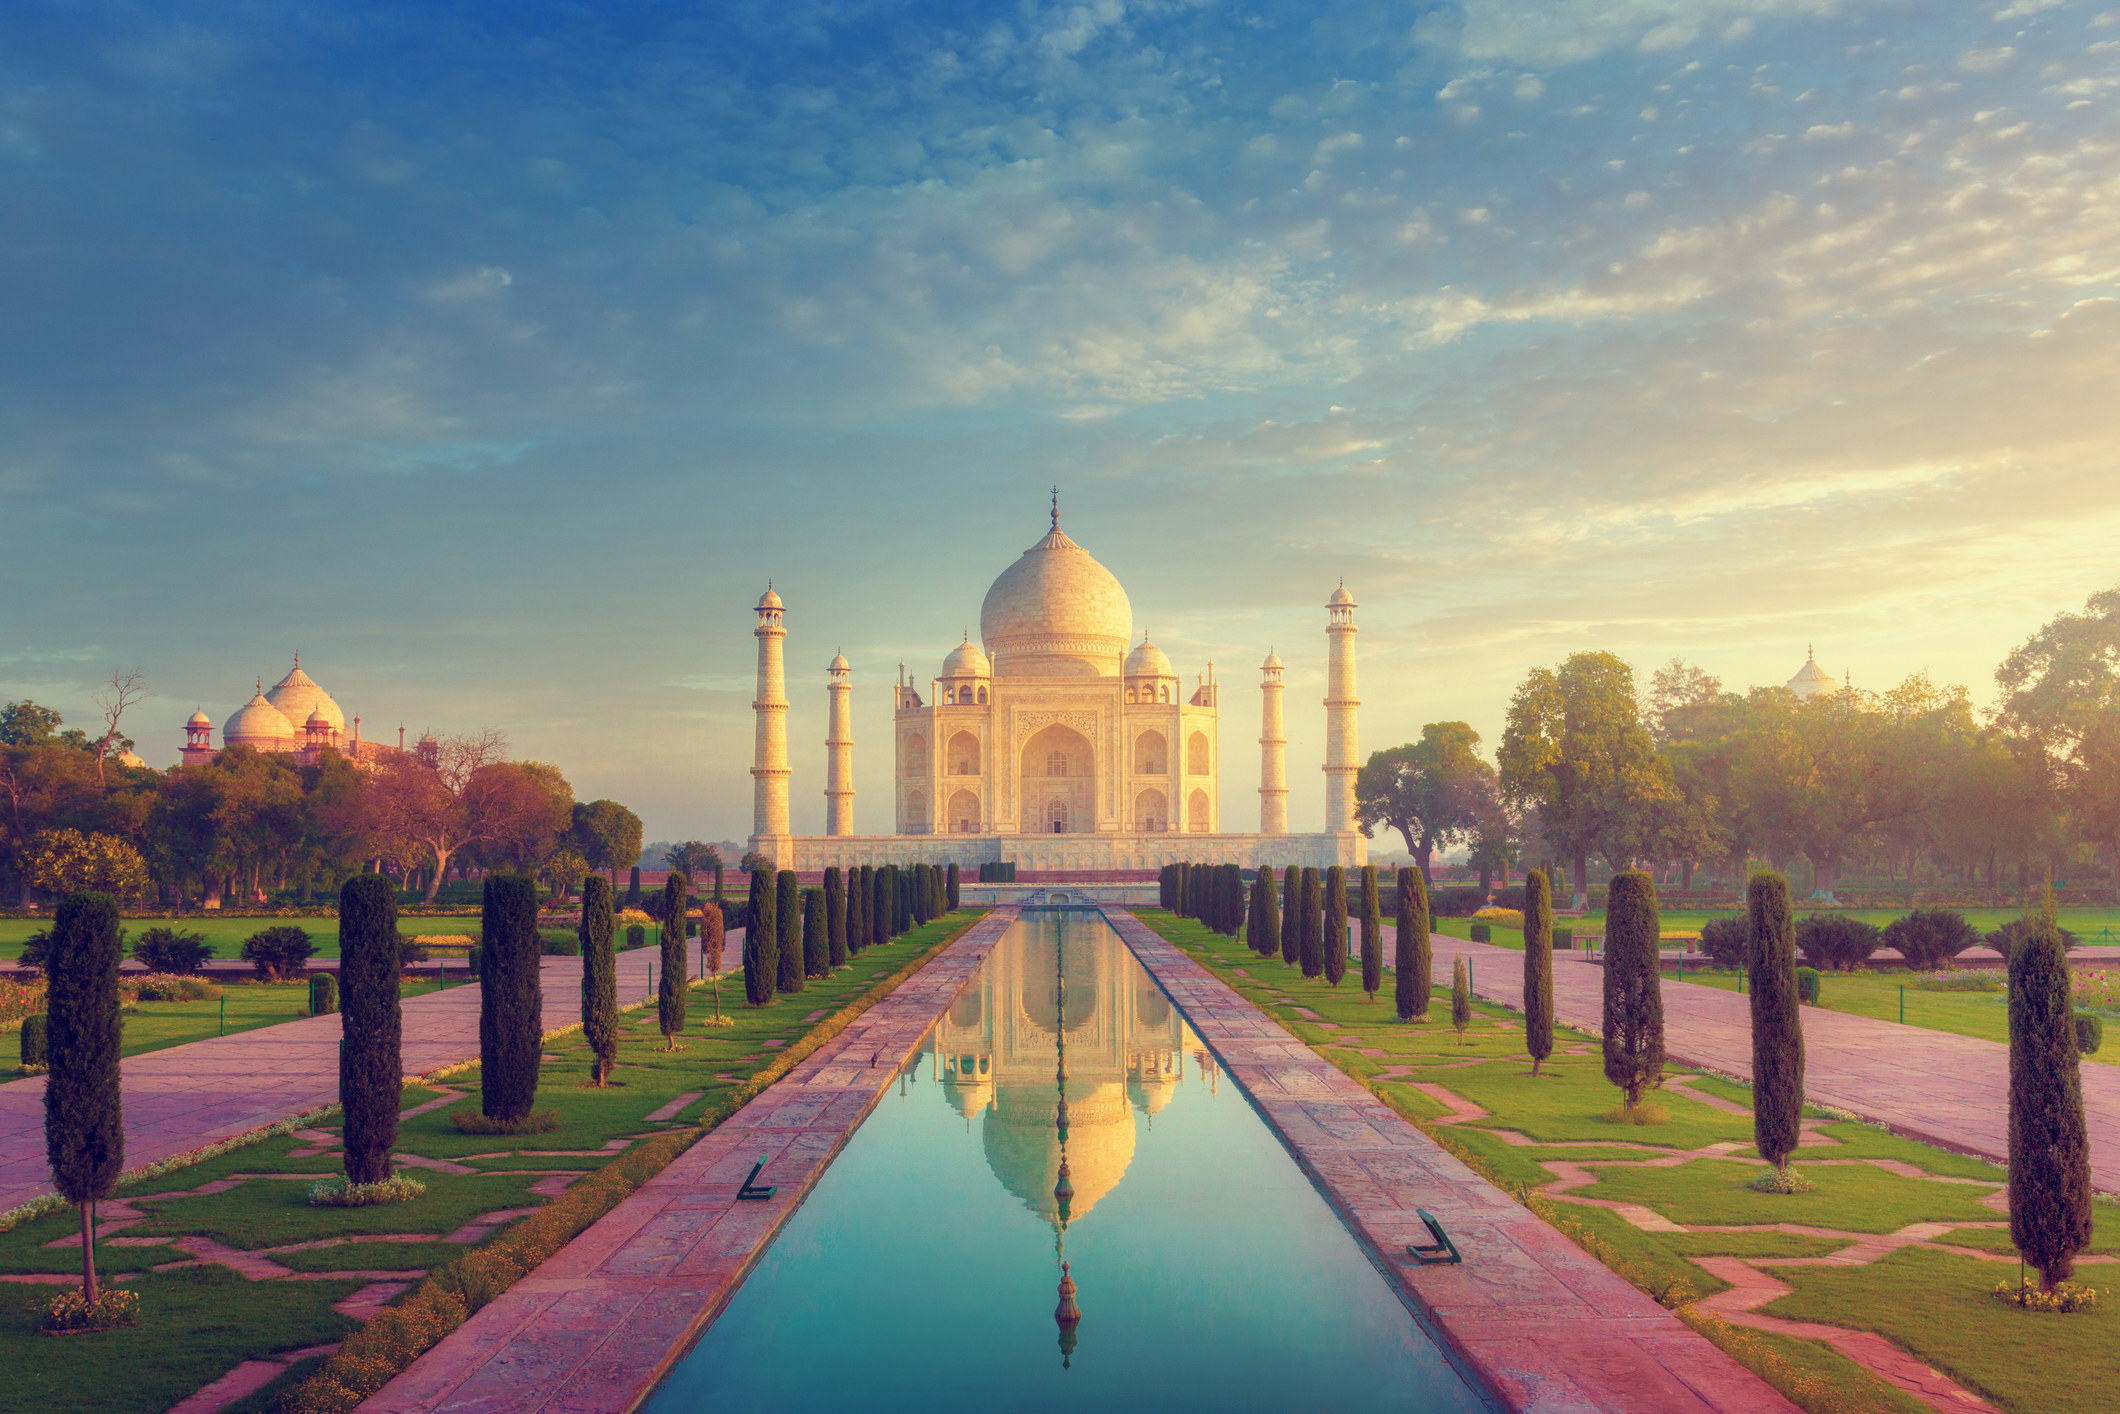 The Taj Mahal on a sunny day.